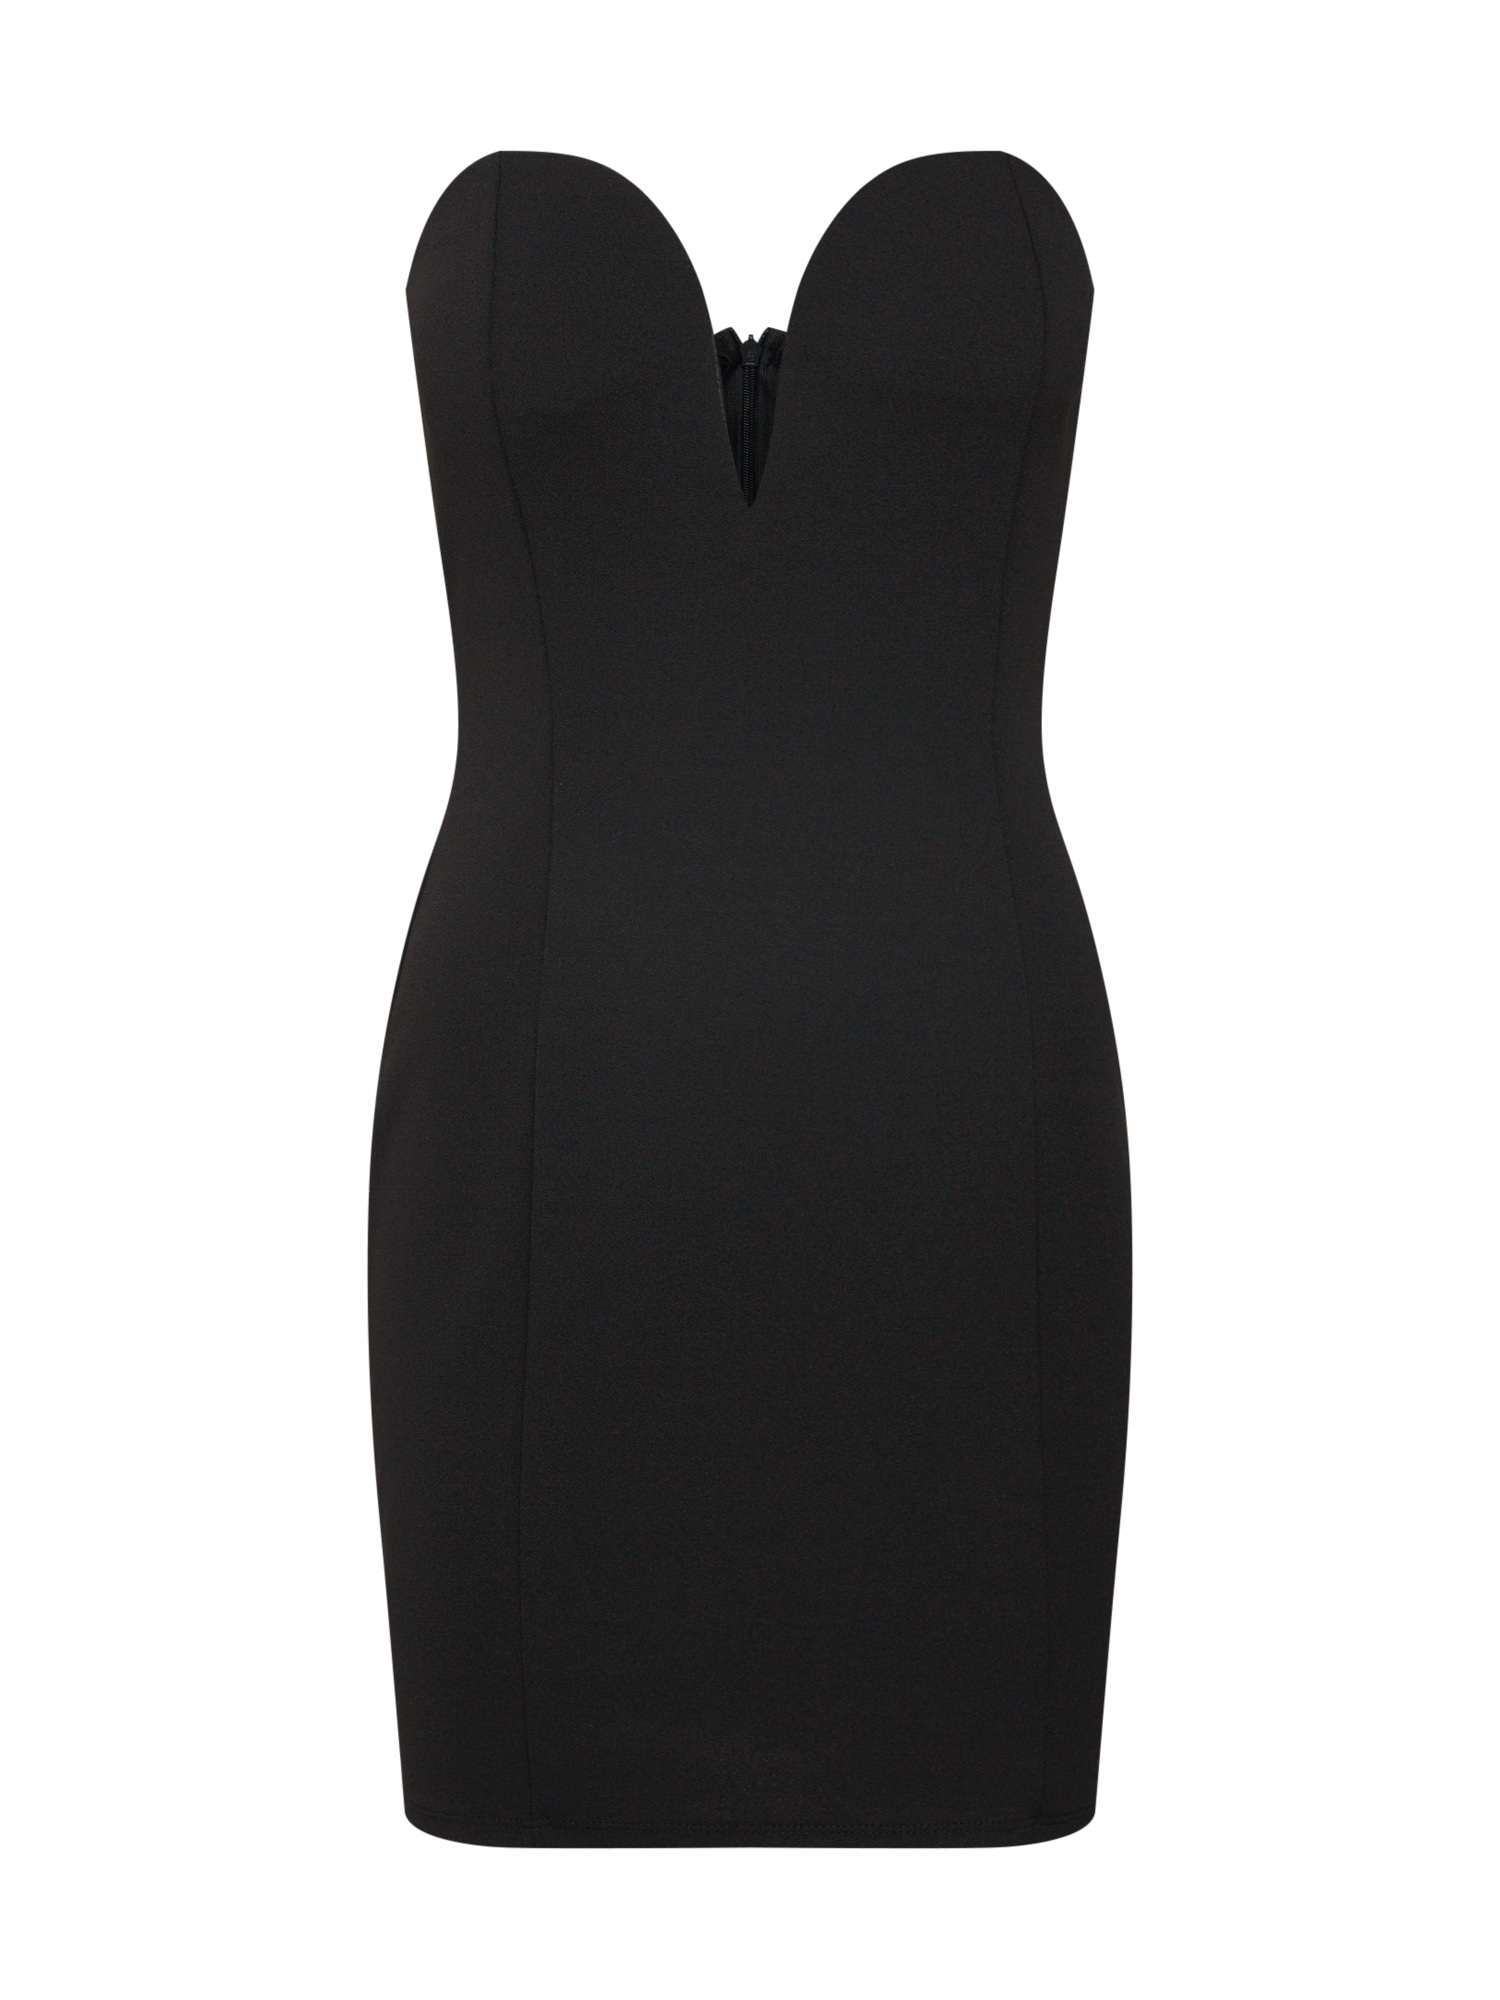 Koktejlové šaty Strapless černá Boohoo